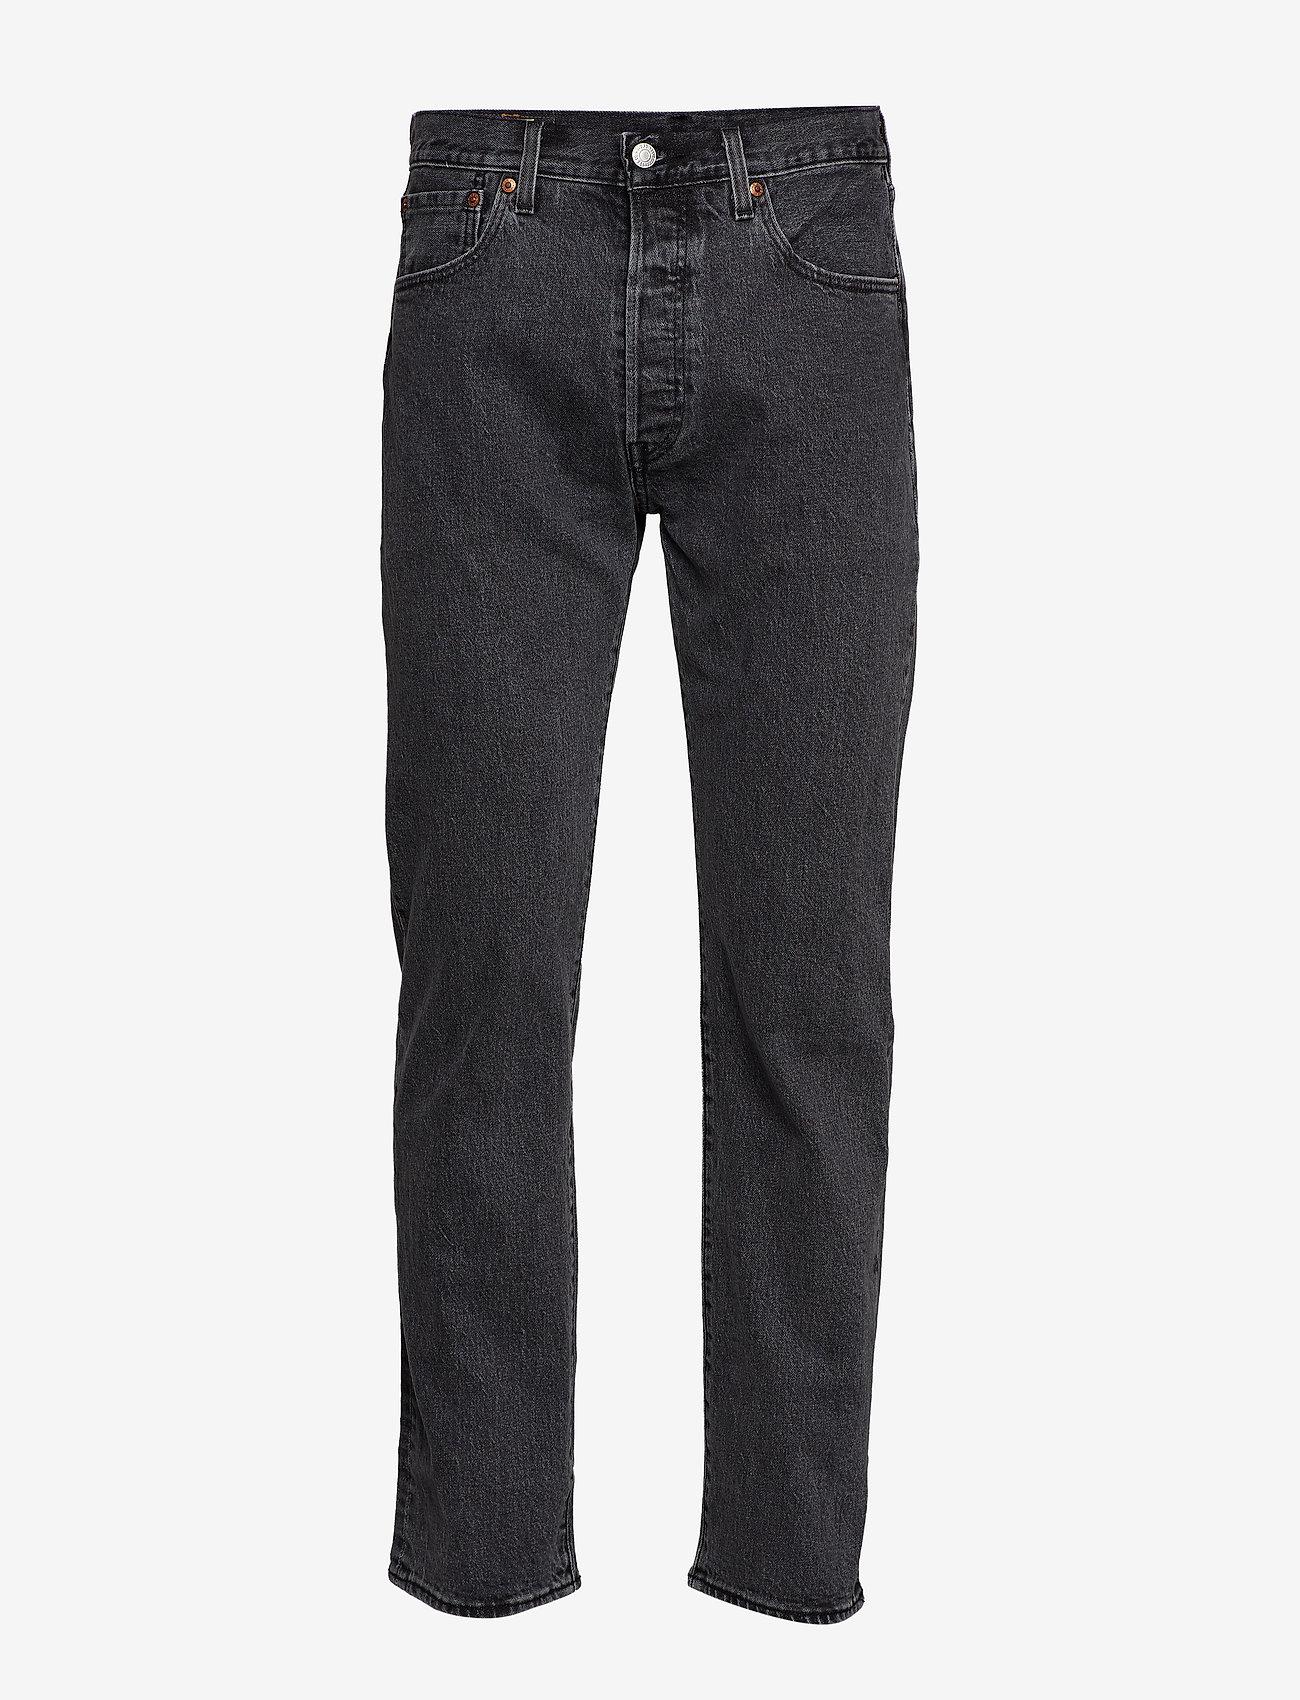 LEVI´S Men - 501 93 STRAIGHT RAISIN STONE - regular jeans - med indigo - worn in